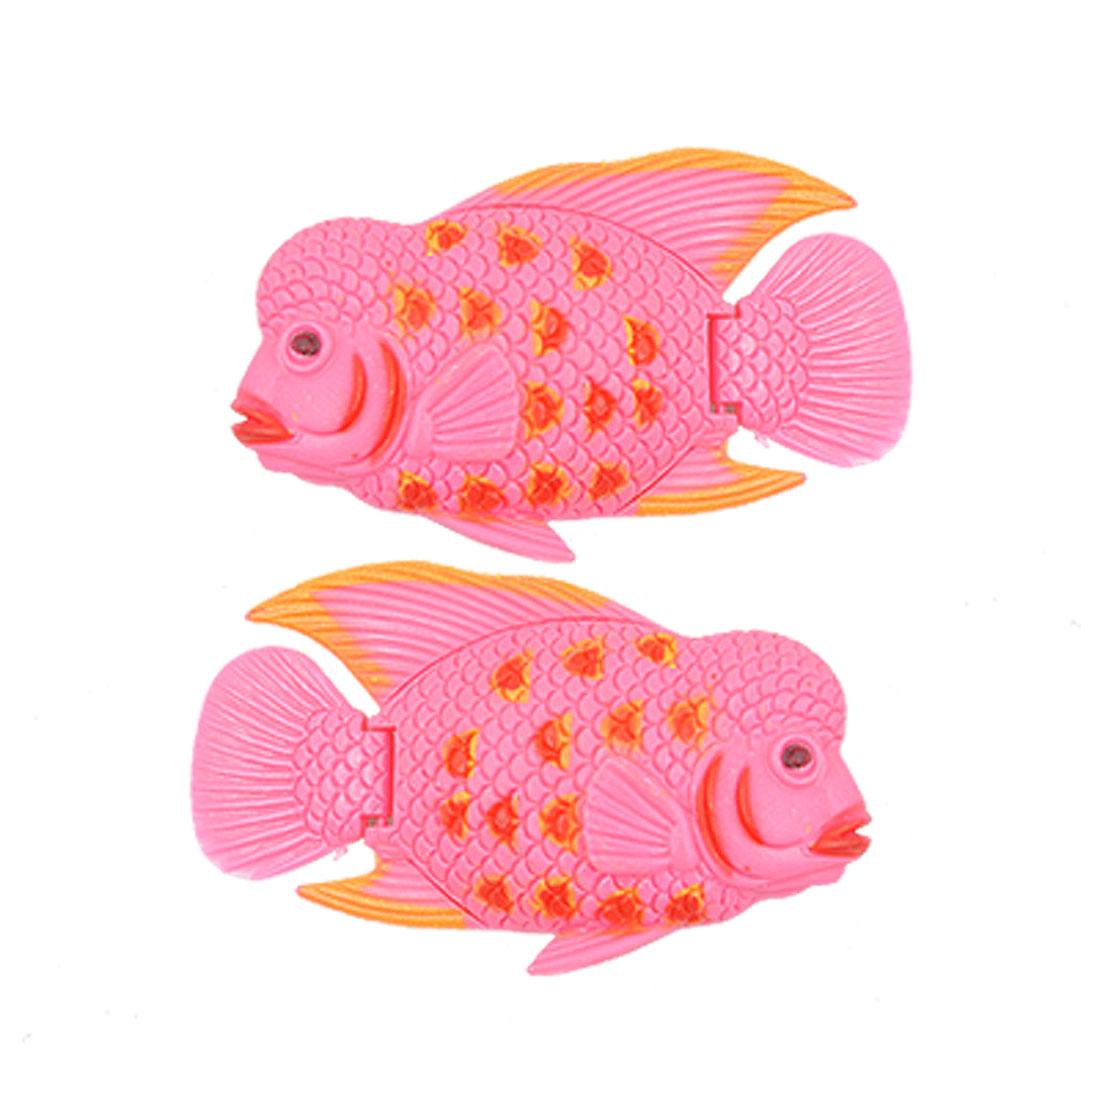 2 pcs Aquarium Fish Tank Plastic Floating Fishes Decoration